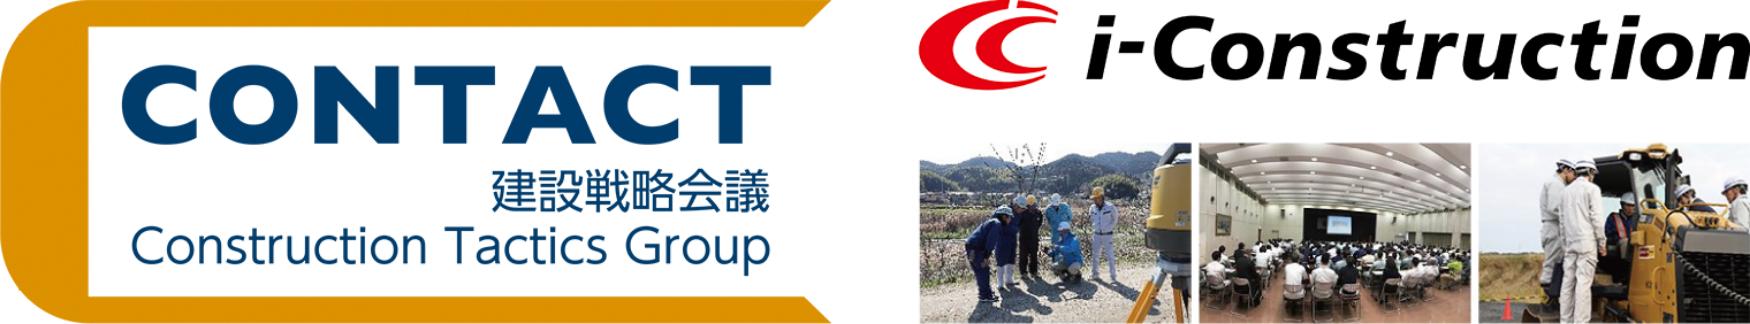 CONTACTはi-Constructionの普及を推進します。